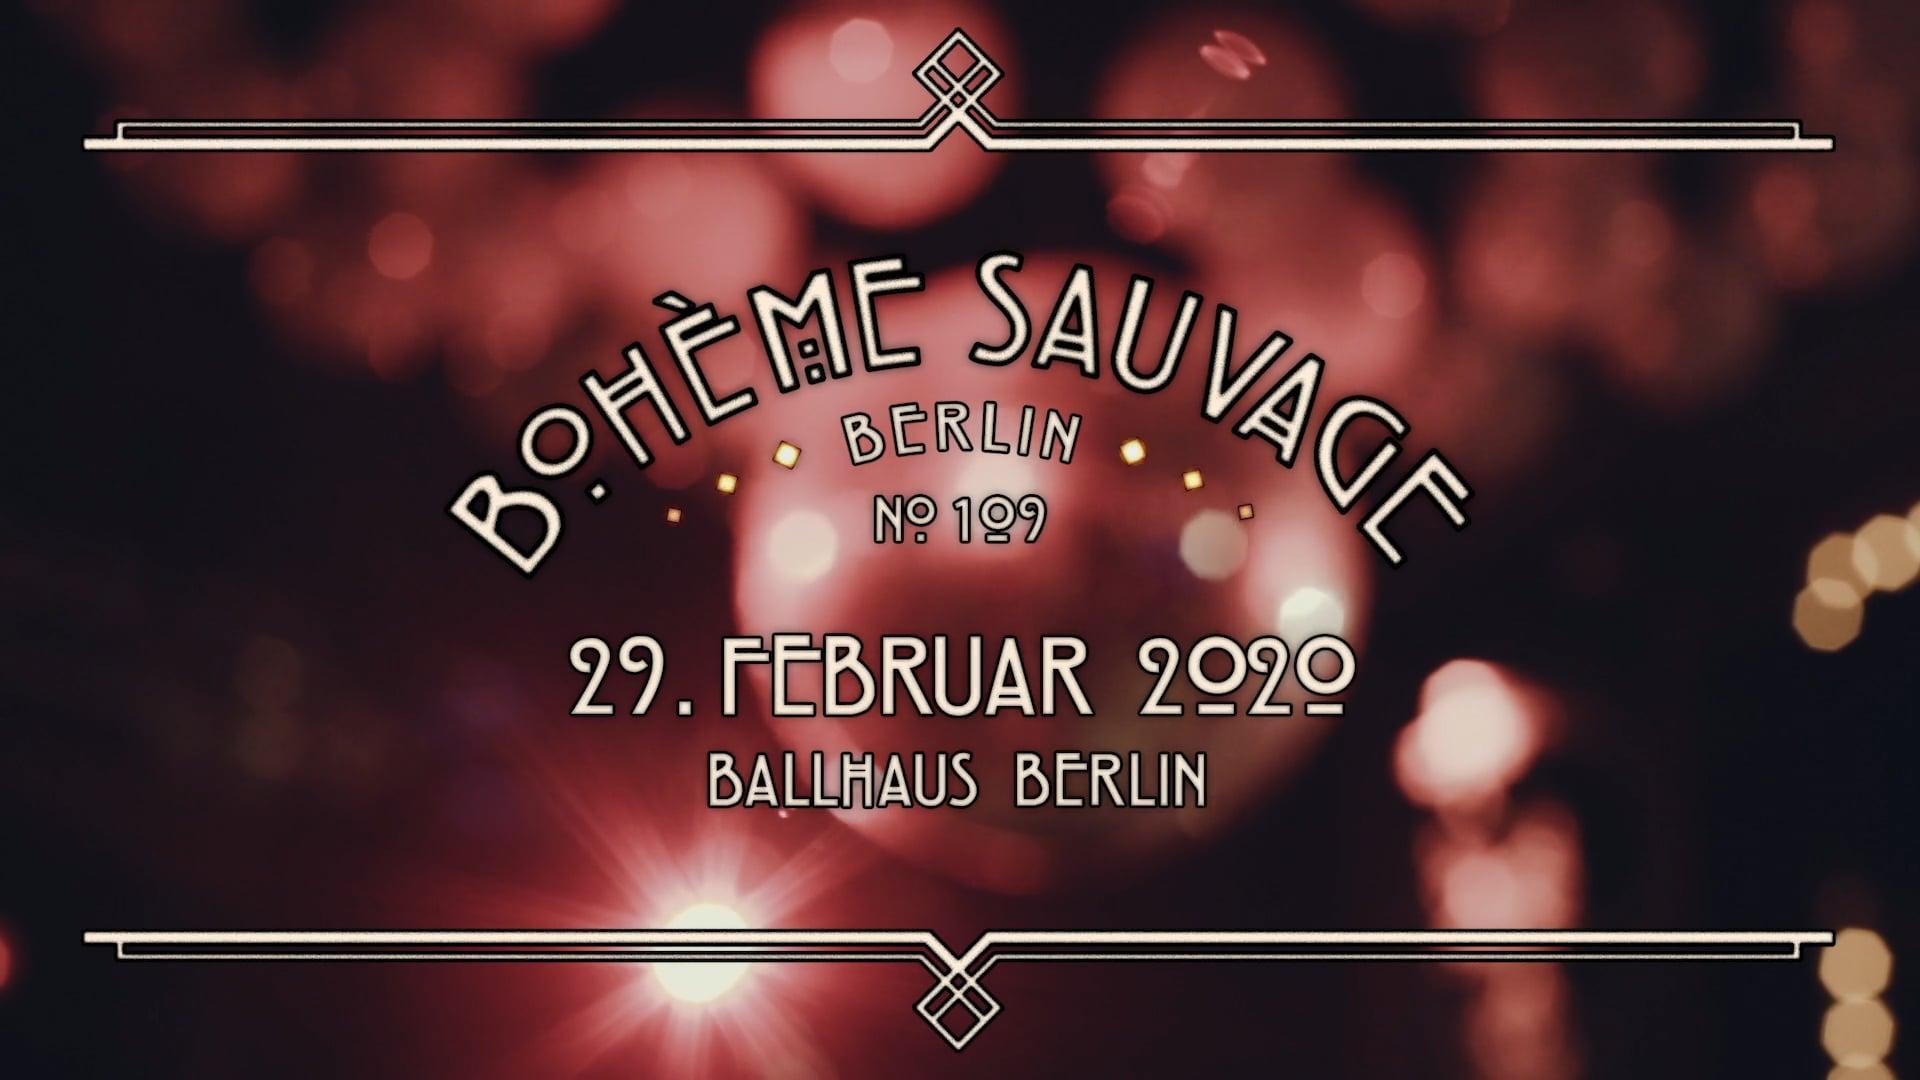 Bohème Sauvage Berlin Nº109 - 29. Februar 2020 - Ballhaus